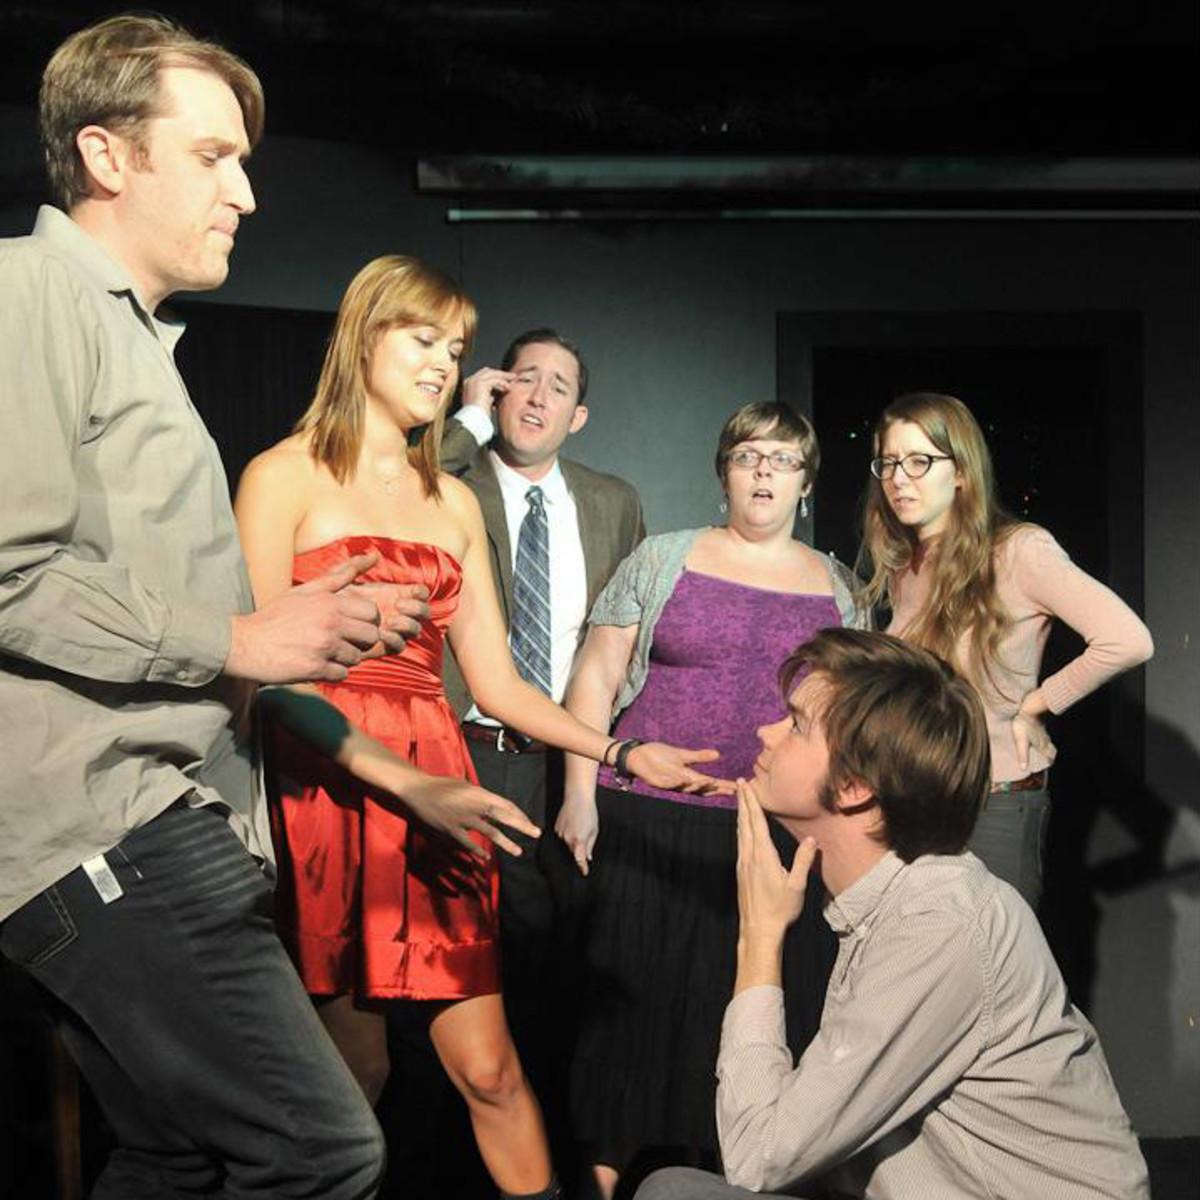 Austin photo: Events_Improv wins_megaphone show_feb 2013_improv sketch